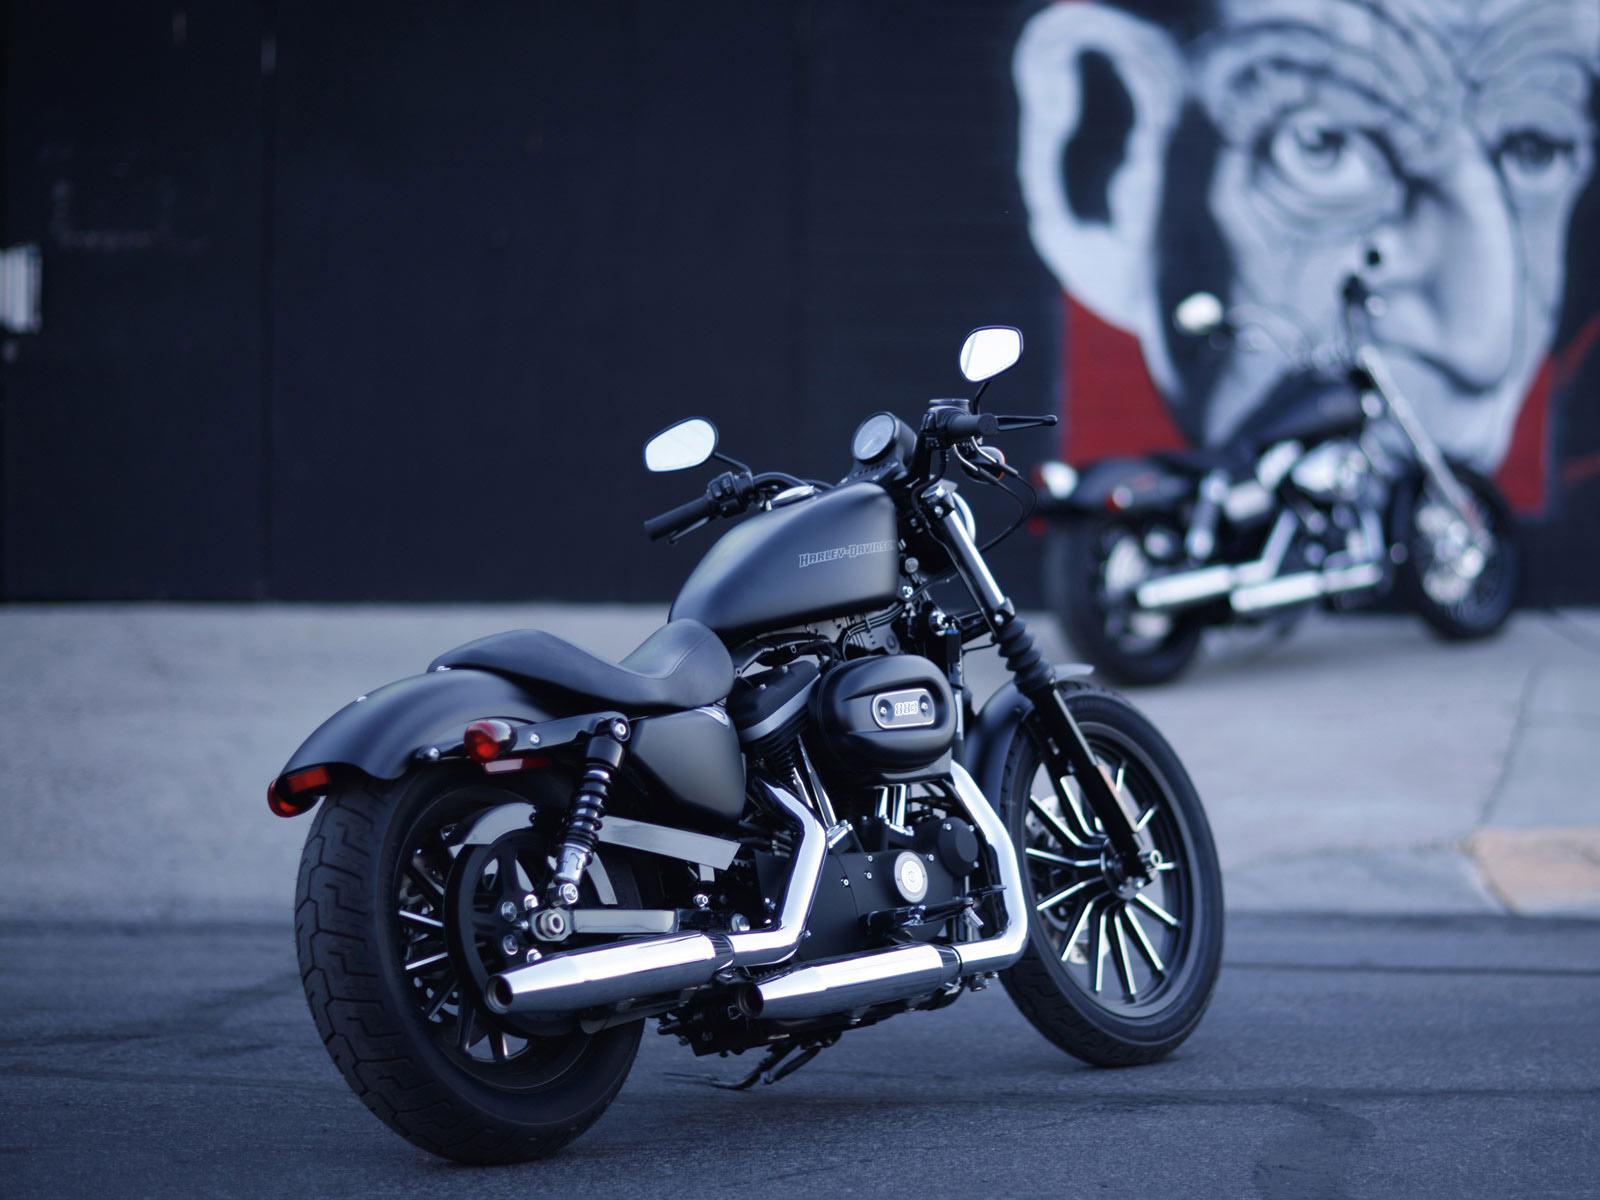 Mobile Hd Wallpapers Quotes Harley Davidson Hd Wallpaper Free Download Pixelstalk Net